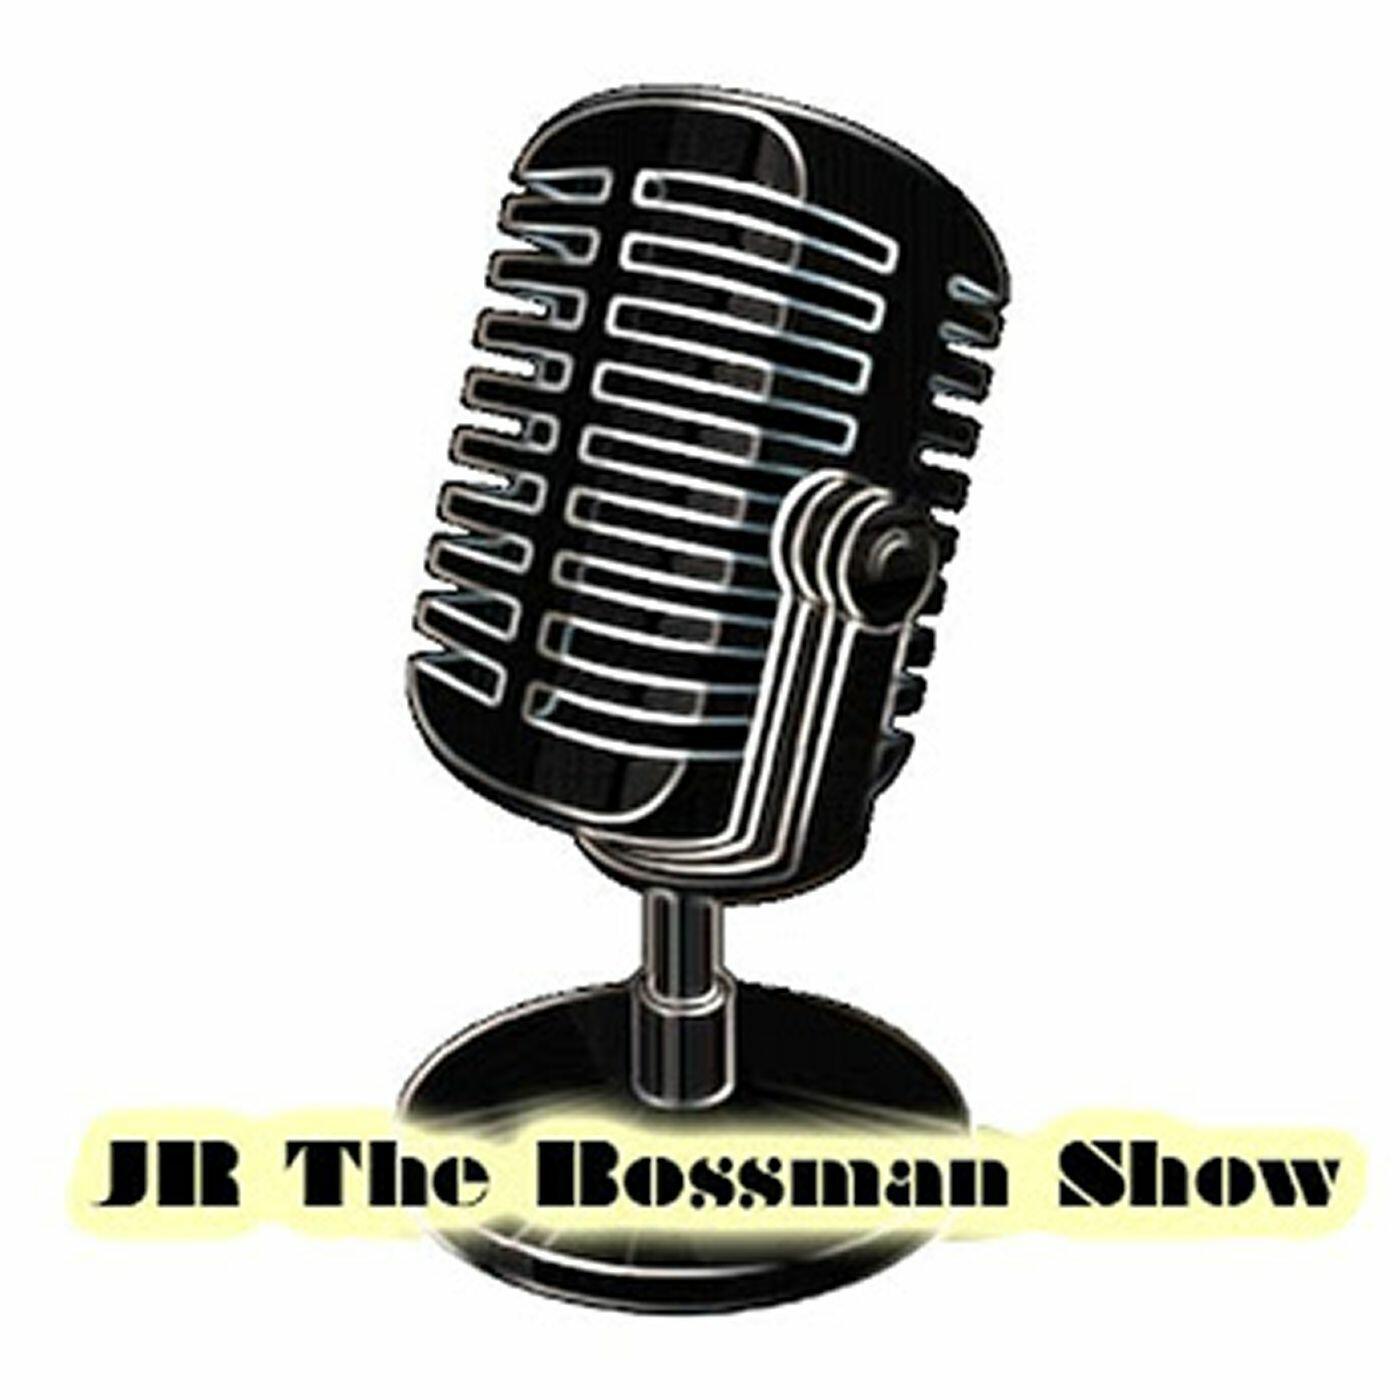 The Bossman Show